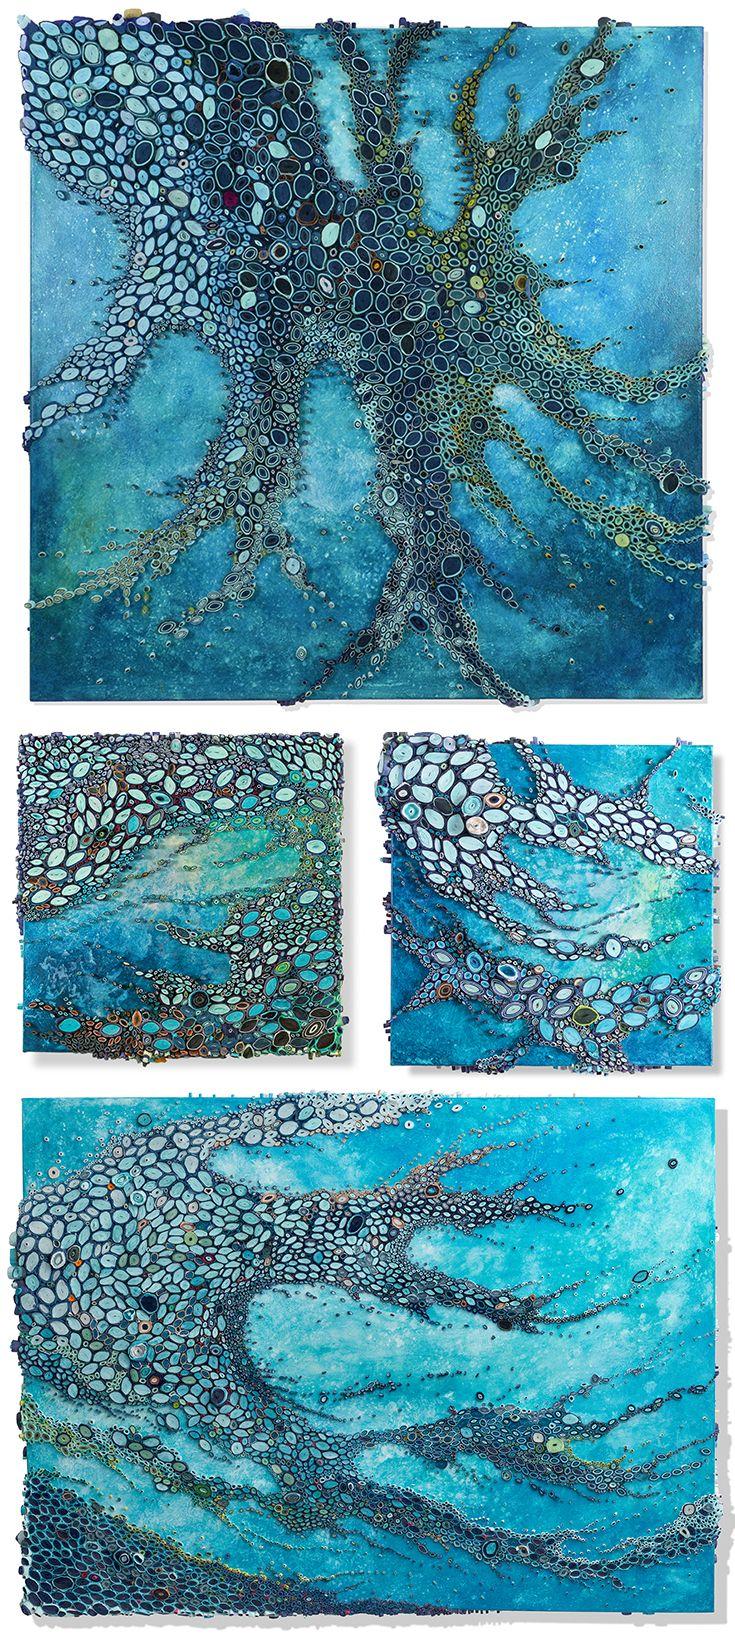 Amy Genser Creates Gorgeous Underwater Reefs From Hundreds ...